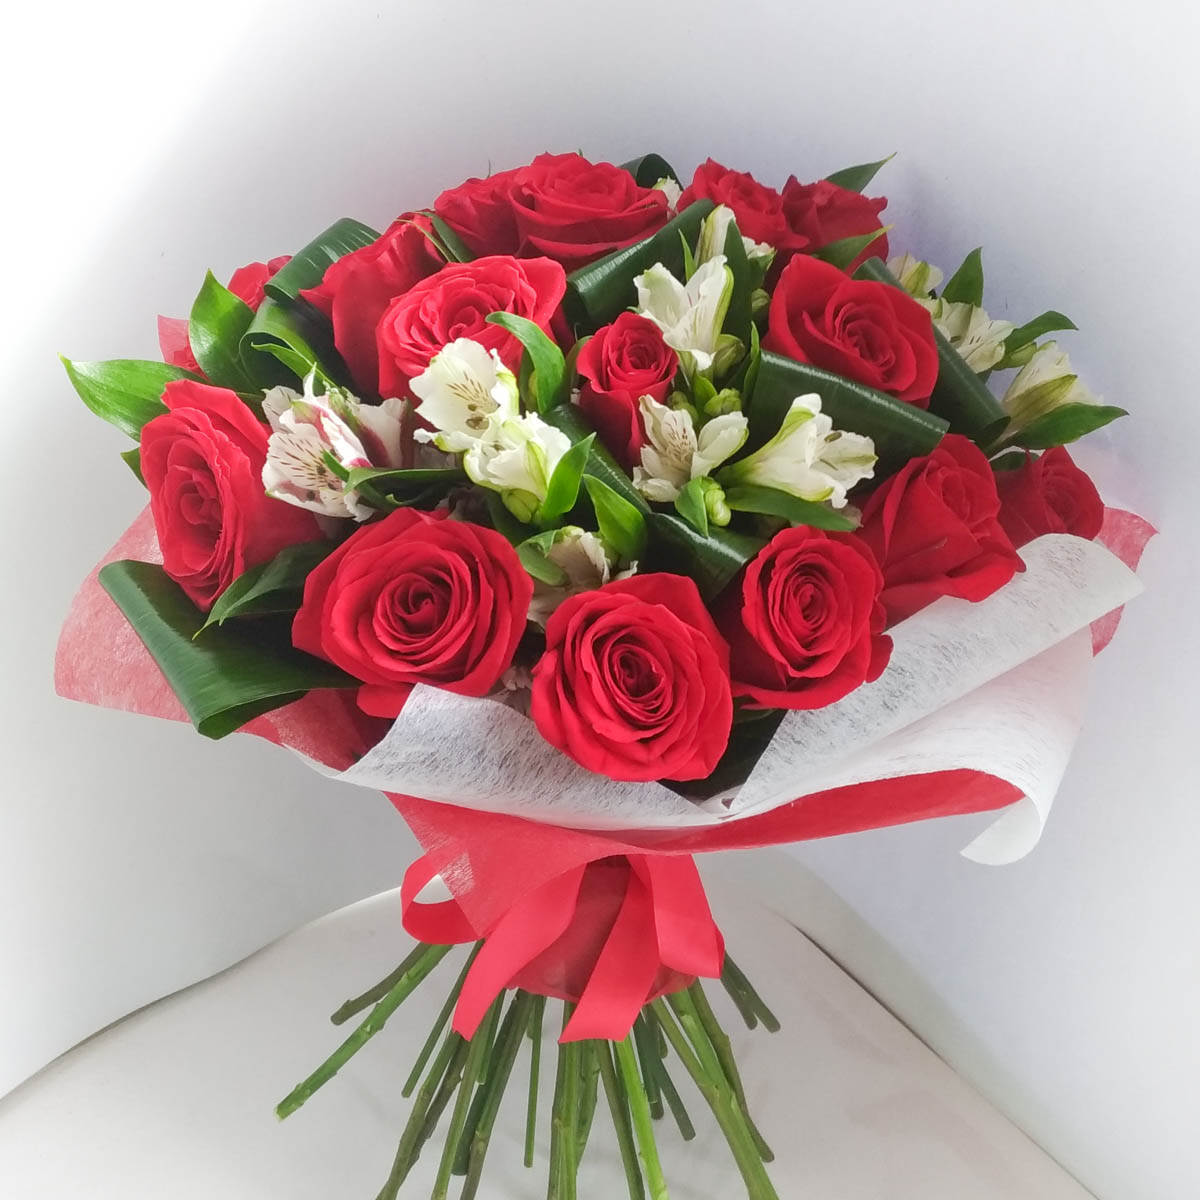 Букет цветов для тебя картинки